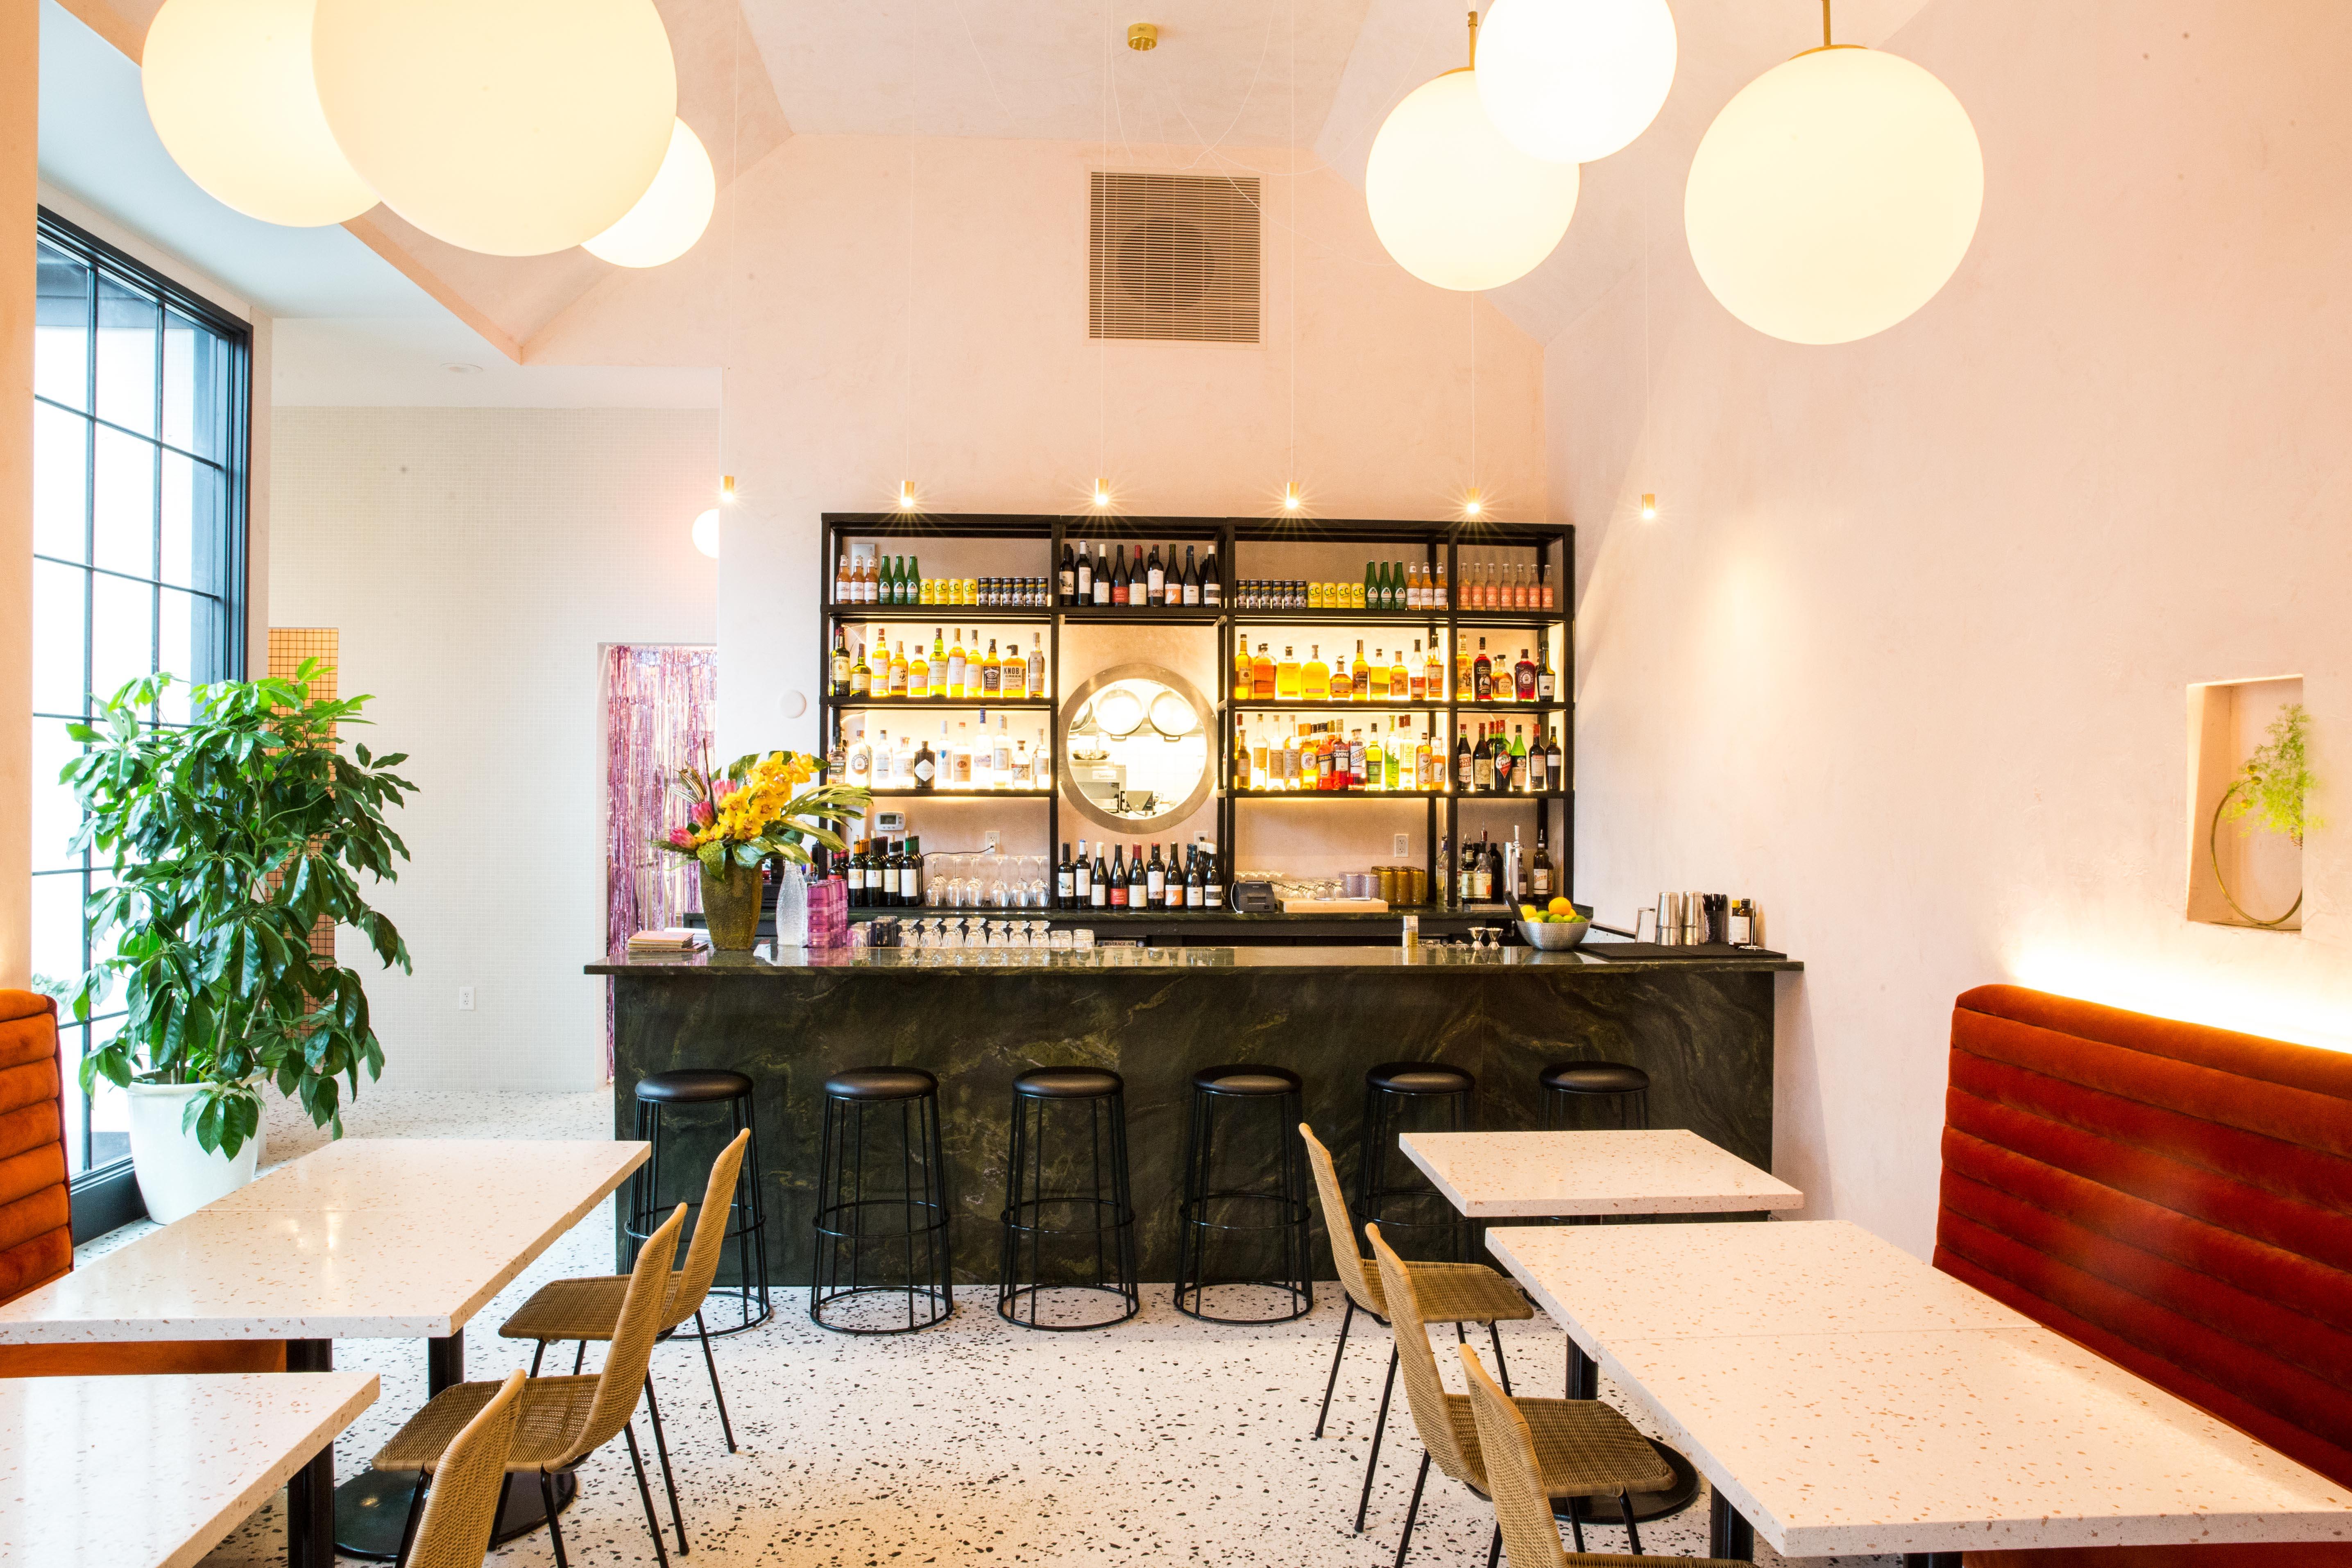 Charleston Restaurants Gather at Tu for Planned Parenthood Bake Sale